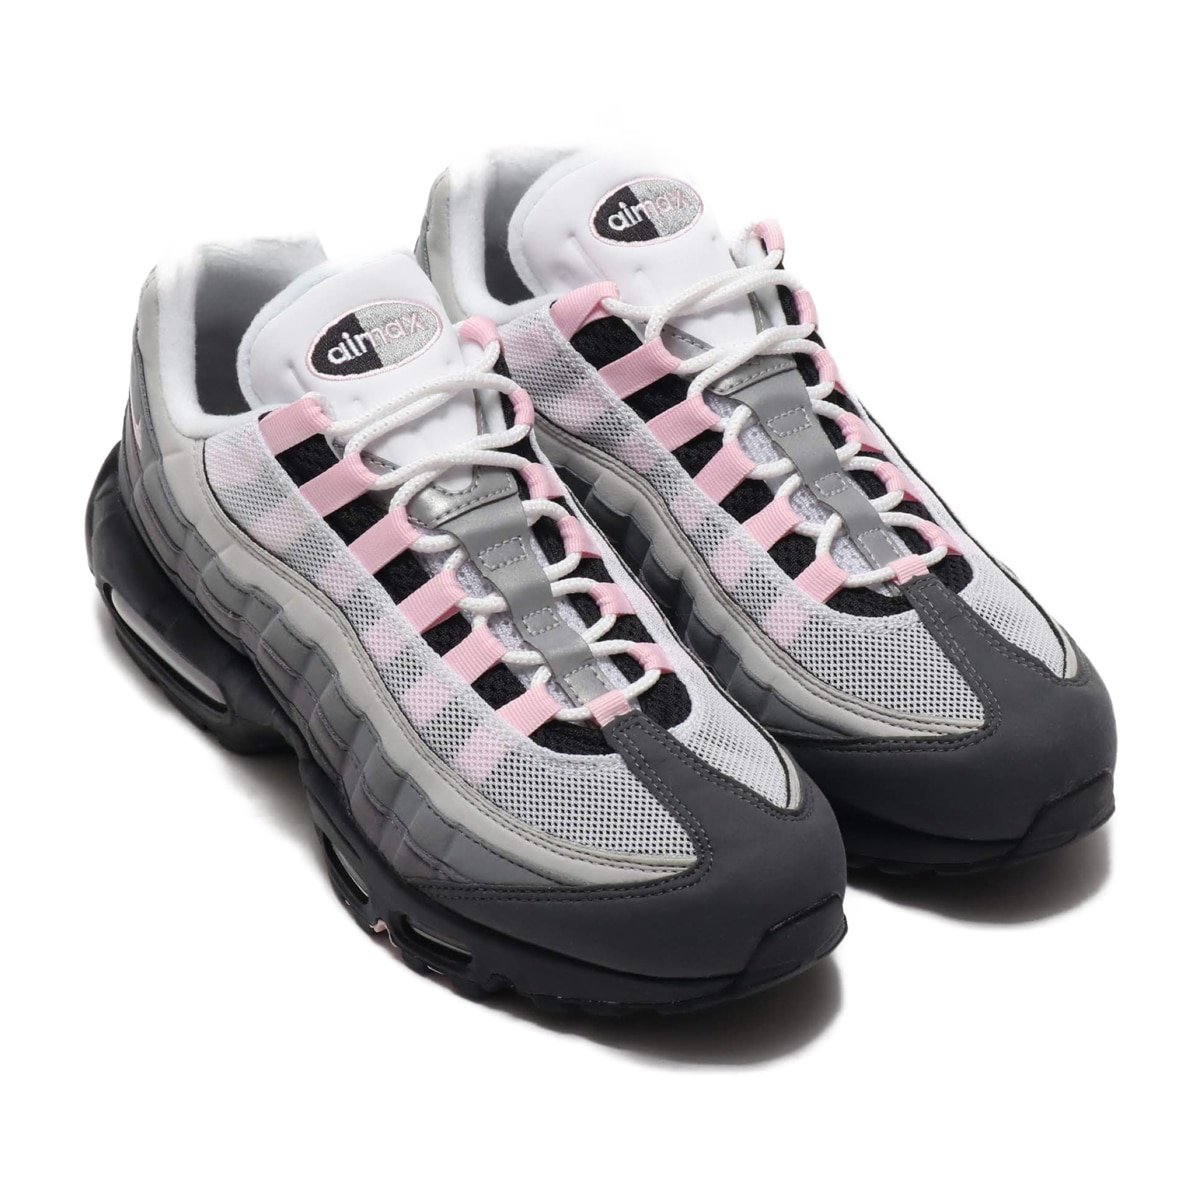 Very Goods Nike Air Max 95 Prm Black Pink Foam Gunsmoke Grey